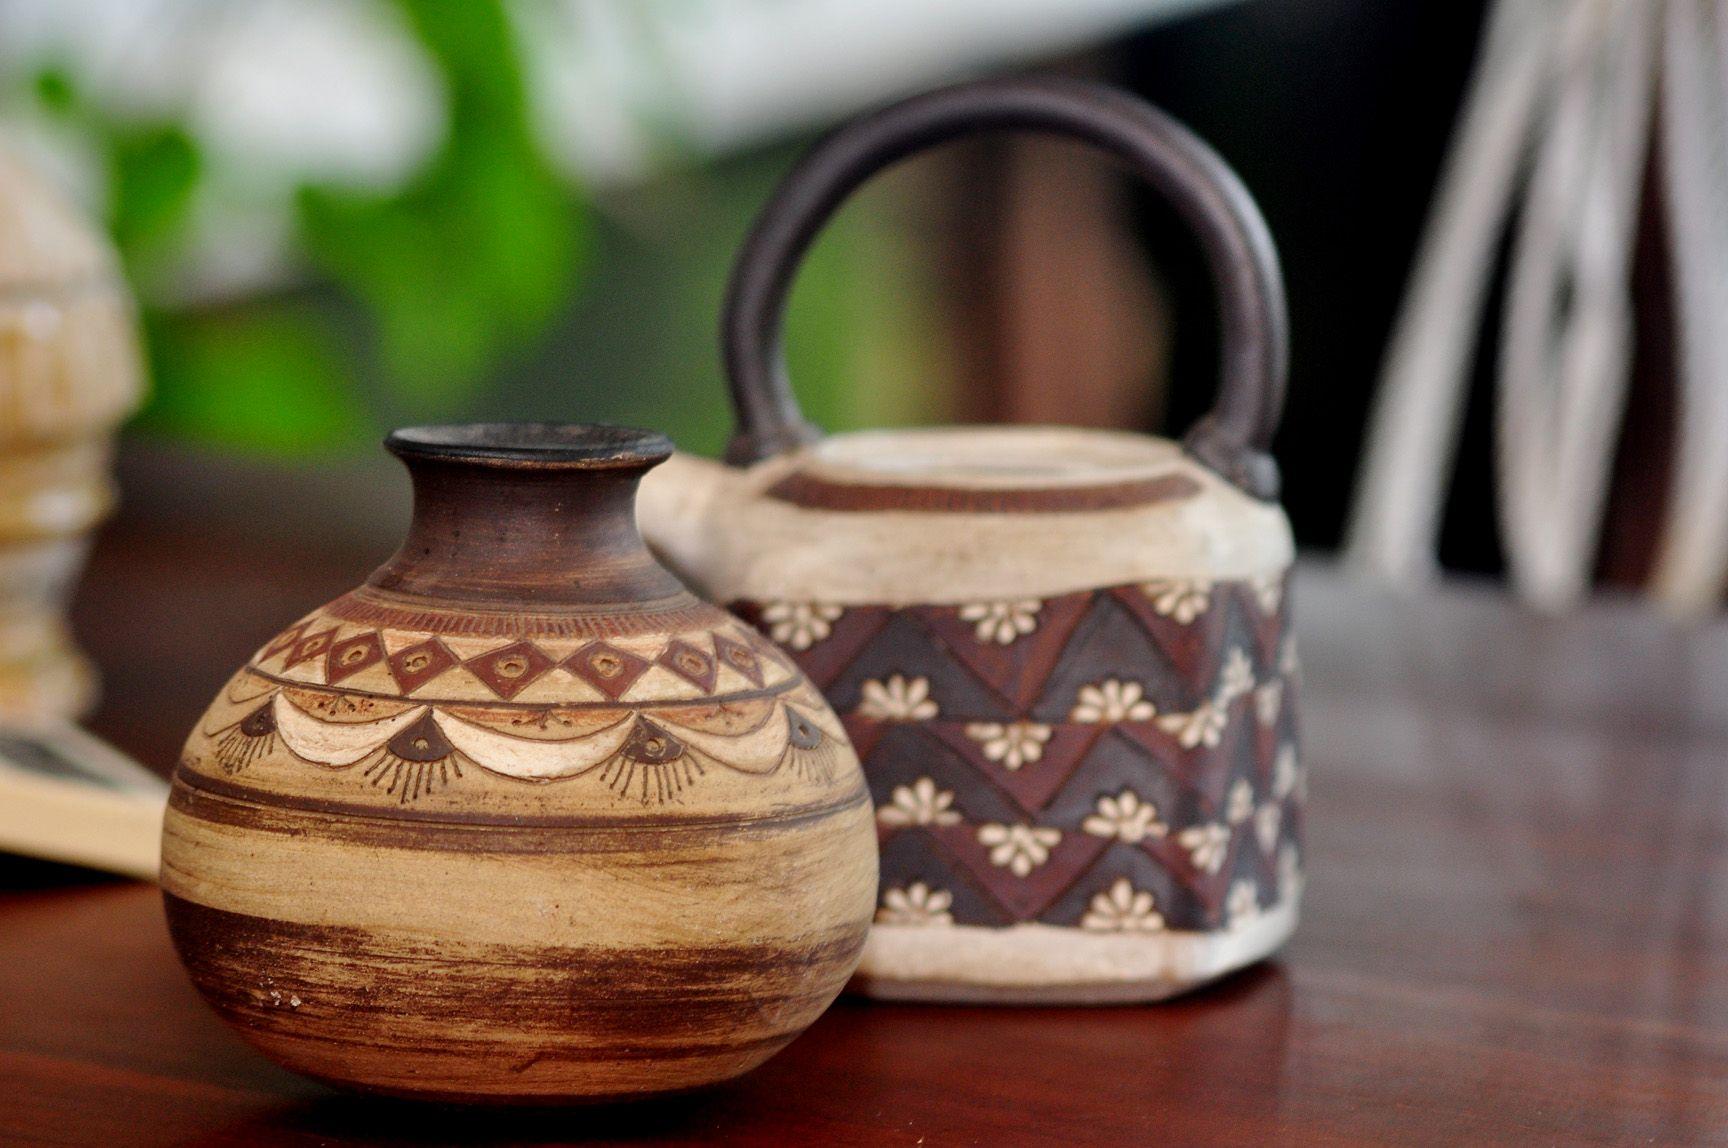 Handmade Ceramic Products By D G H Gunewardane Sri Lankan Rural Crafts At Nuga Gama Cinnamon Grand Colombo 2 Handmade Ceramics Ceramic Art Crafts